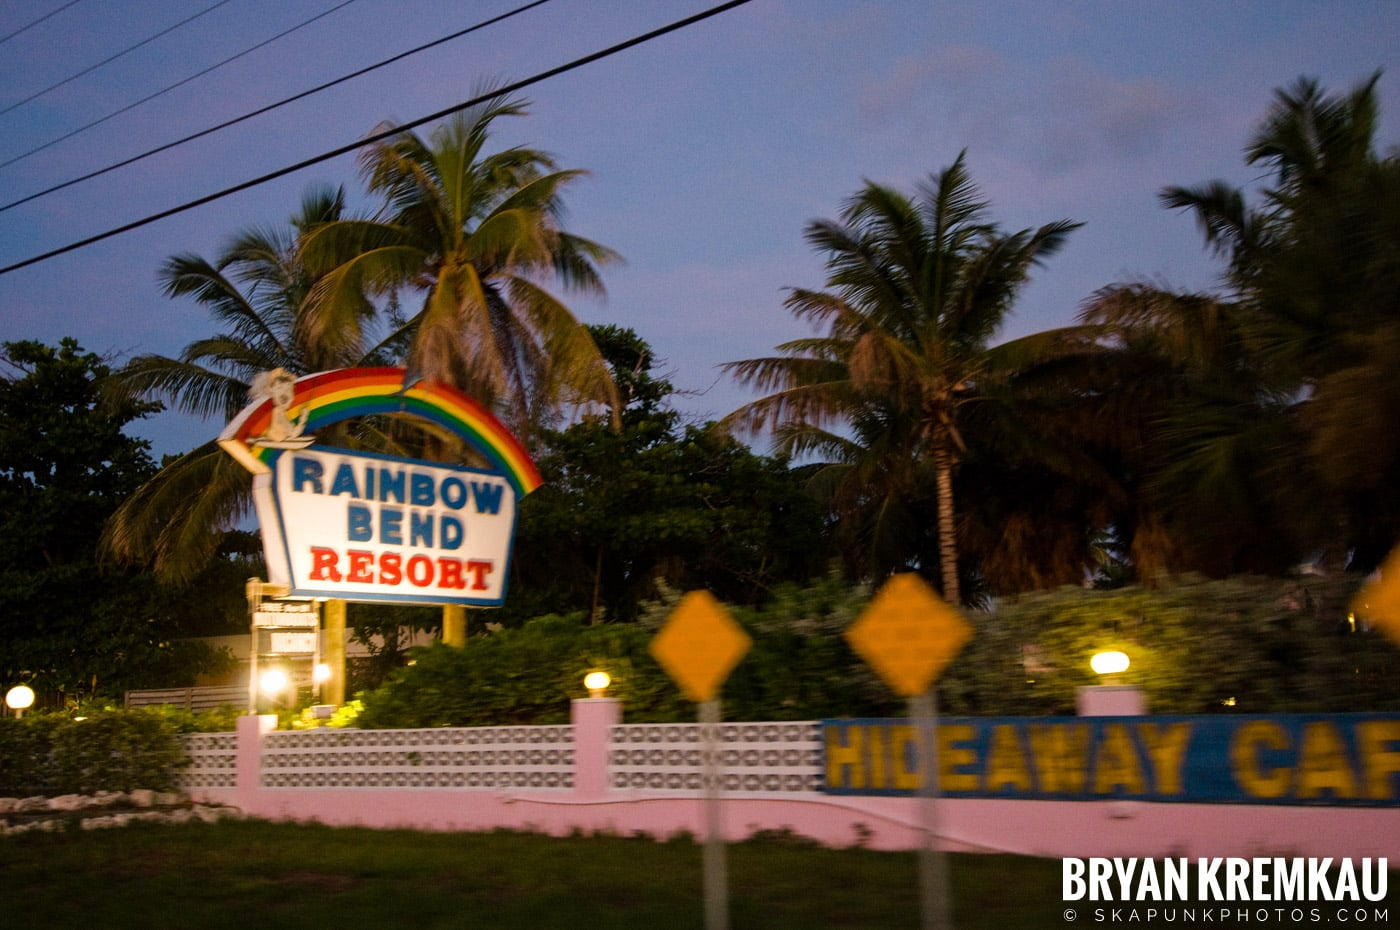 Florida Keys Vacation - 7.09.10 - 7.15.10 (47)